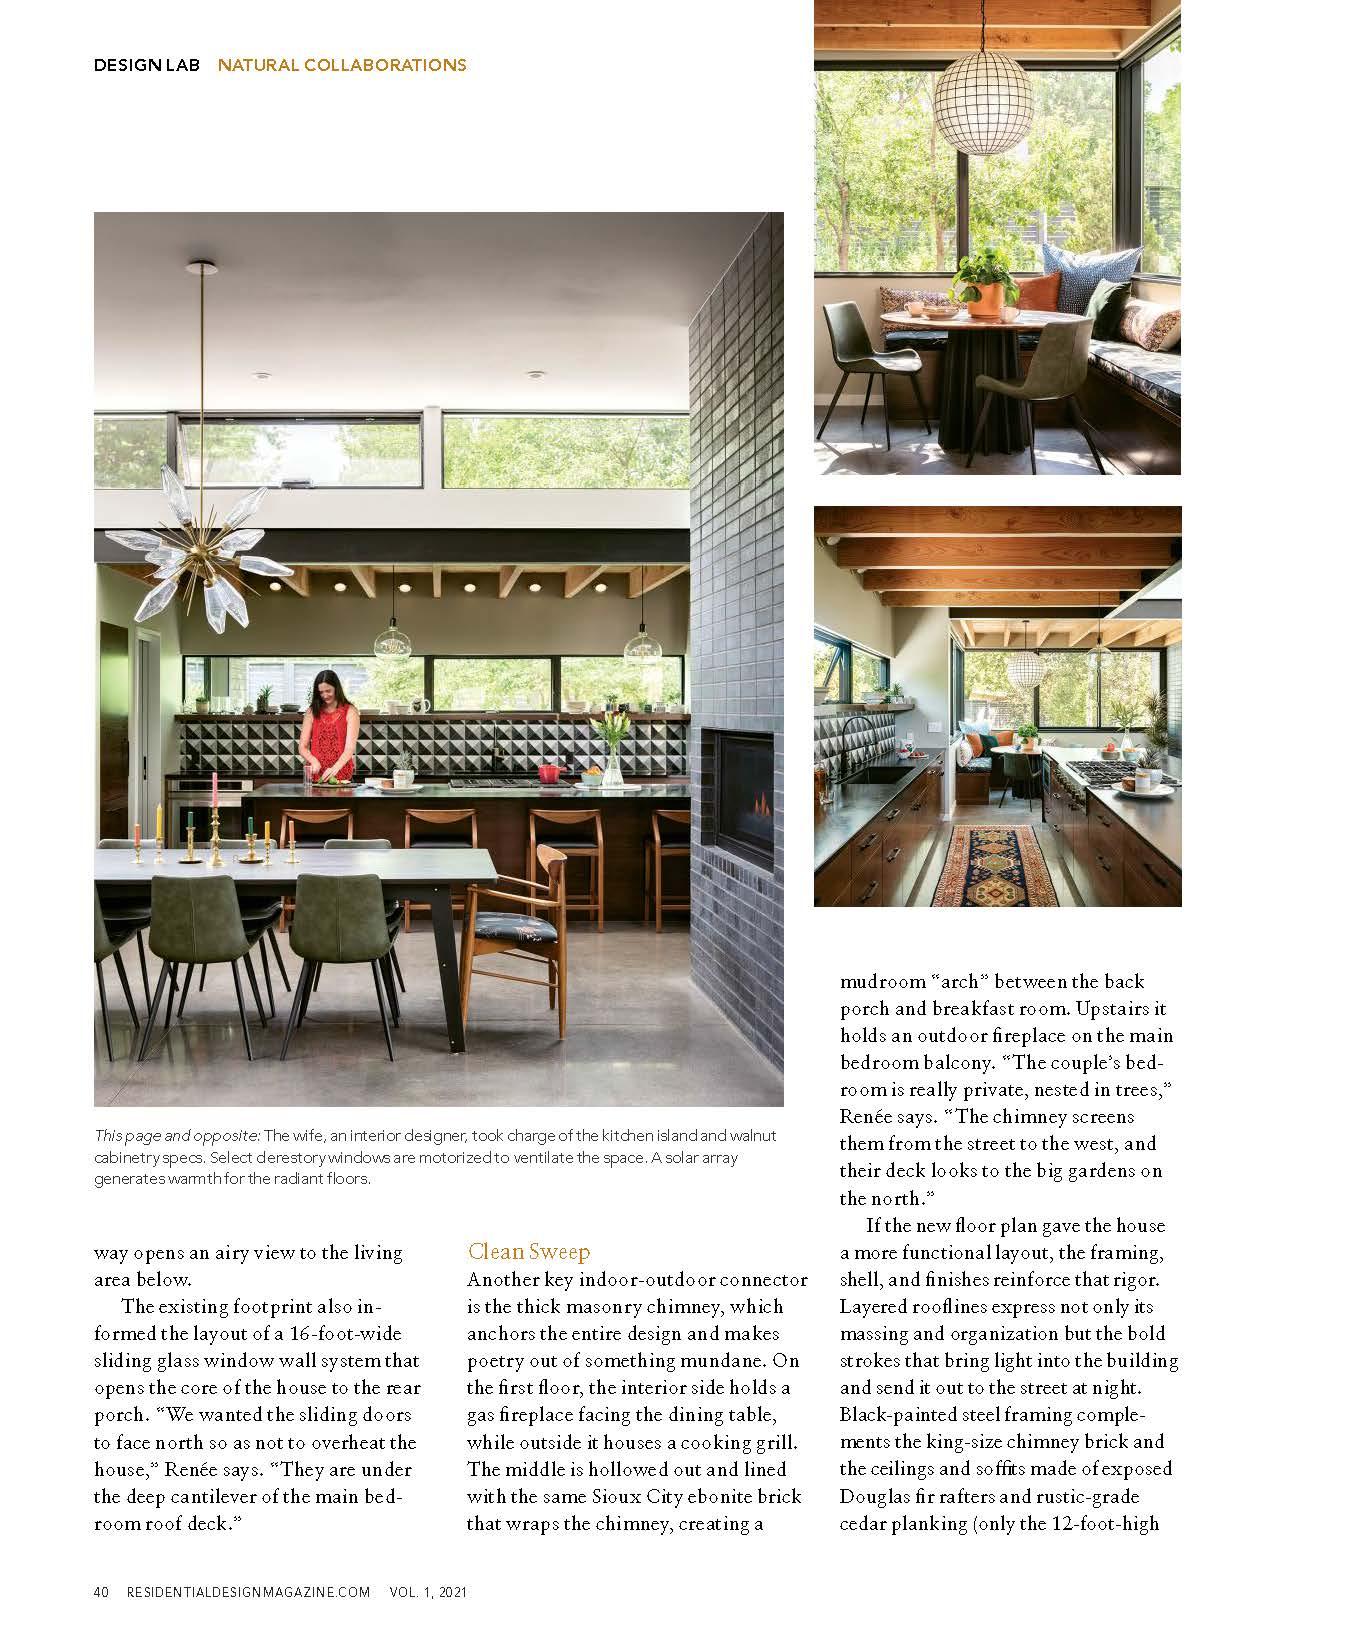 Residential Design Mariposa | Press for Renée del Gaudio Architecture.